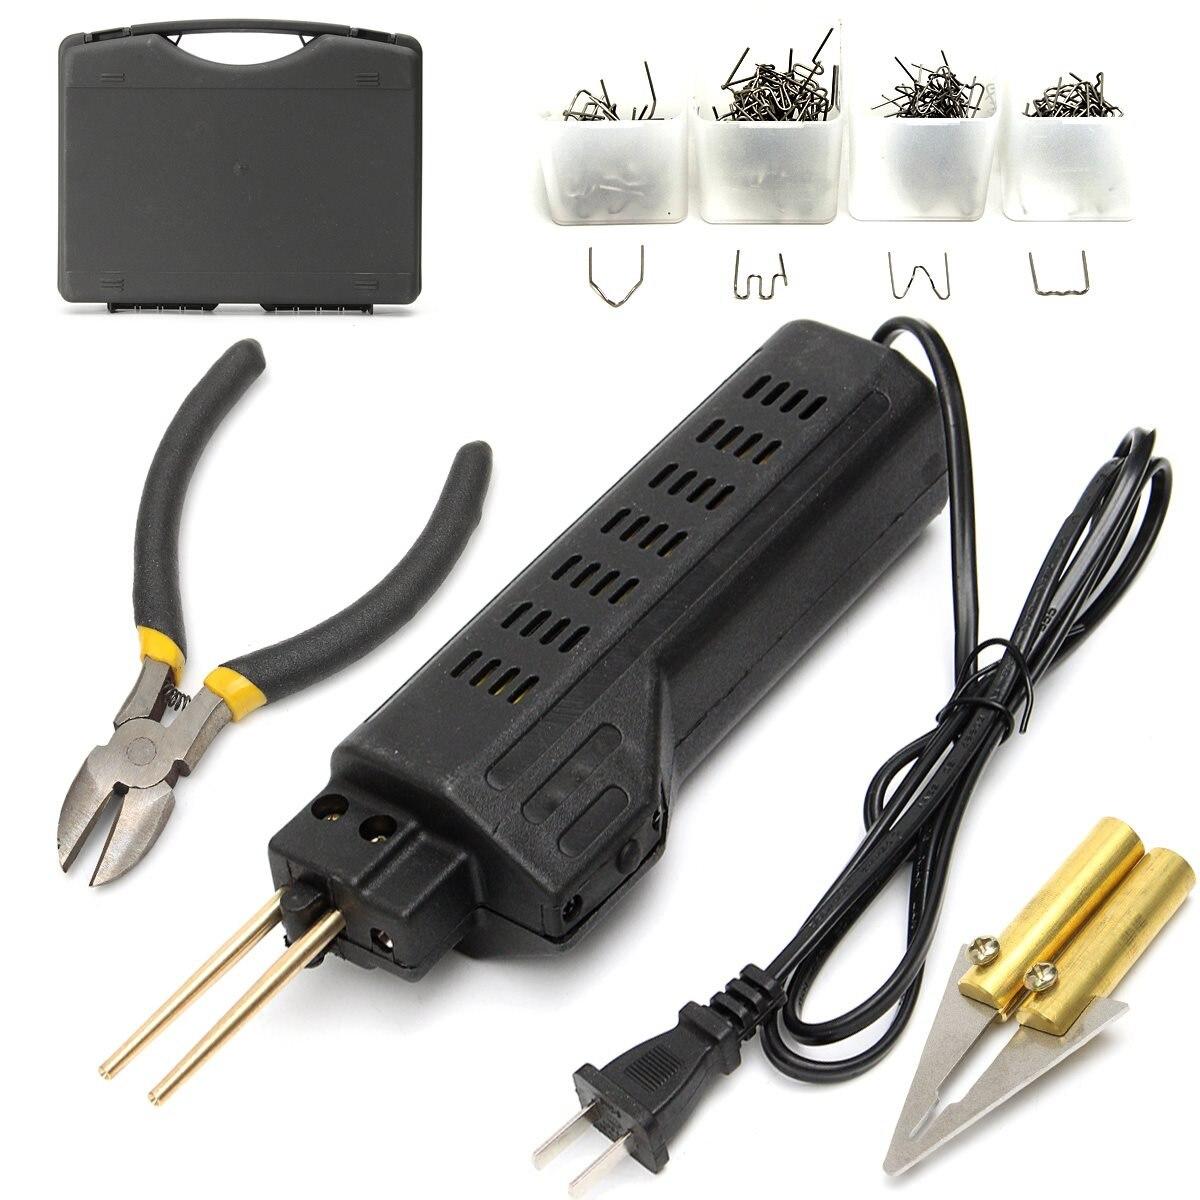 Intelligent 0.6/0.8mm 200 Staples Hot Stapler Car Bumper Plastic Welding Torch Fairing Auto Body Tool Welder Machine 220-250v Non-Ironing Welding Equipment